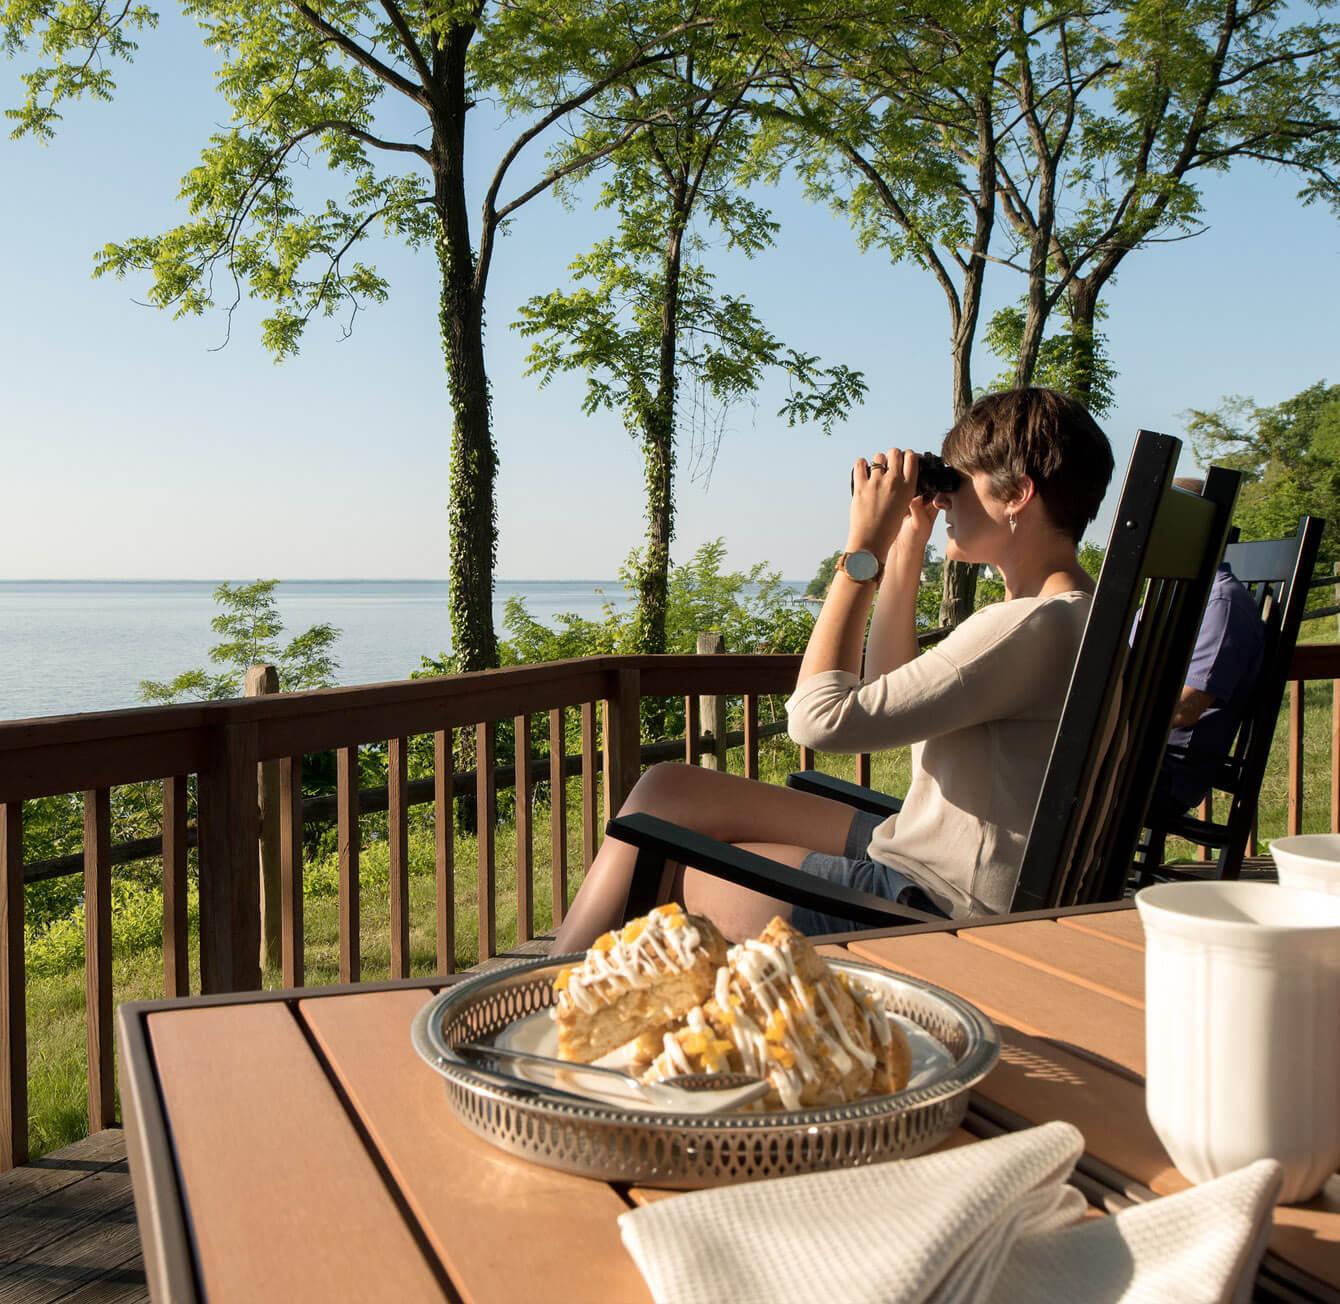 spacious waterfront inn with woman looking through binoculars